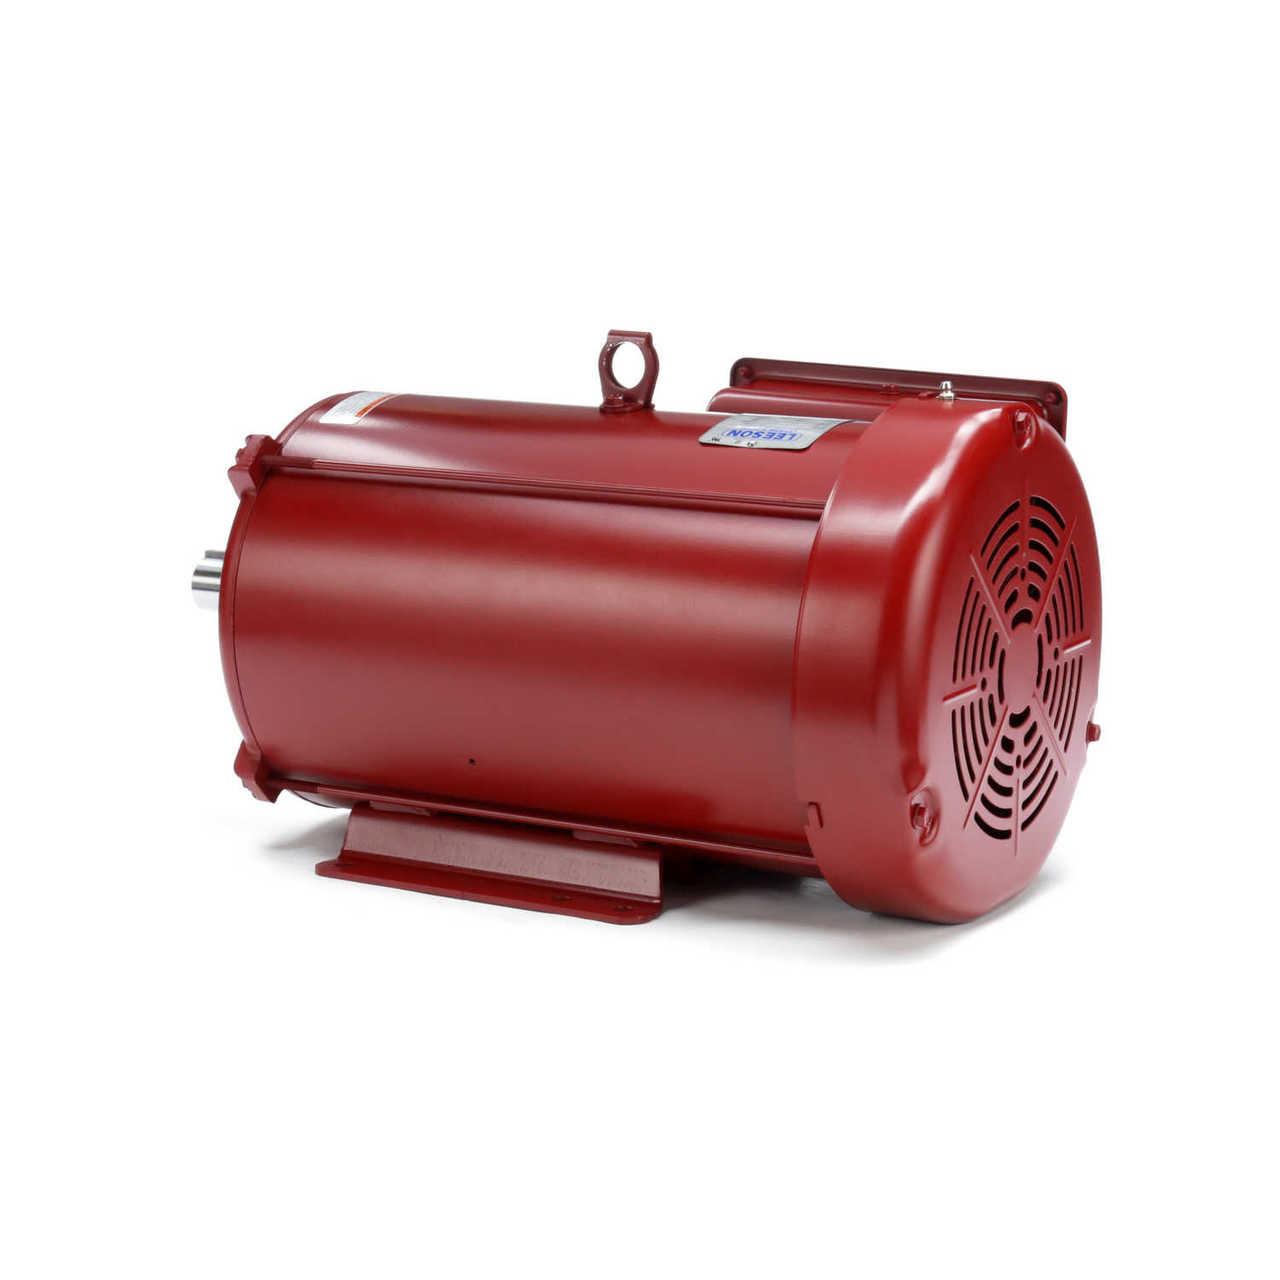 7 5 Hp 1740 Rpm 215t Frame 230volts  Farm Duty  Extra High Torque Leeson Electric Motor   141434